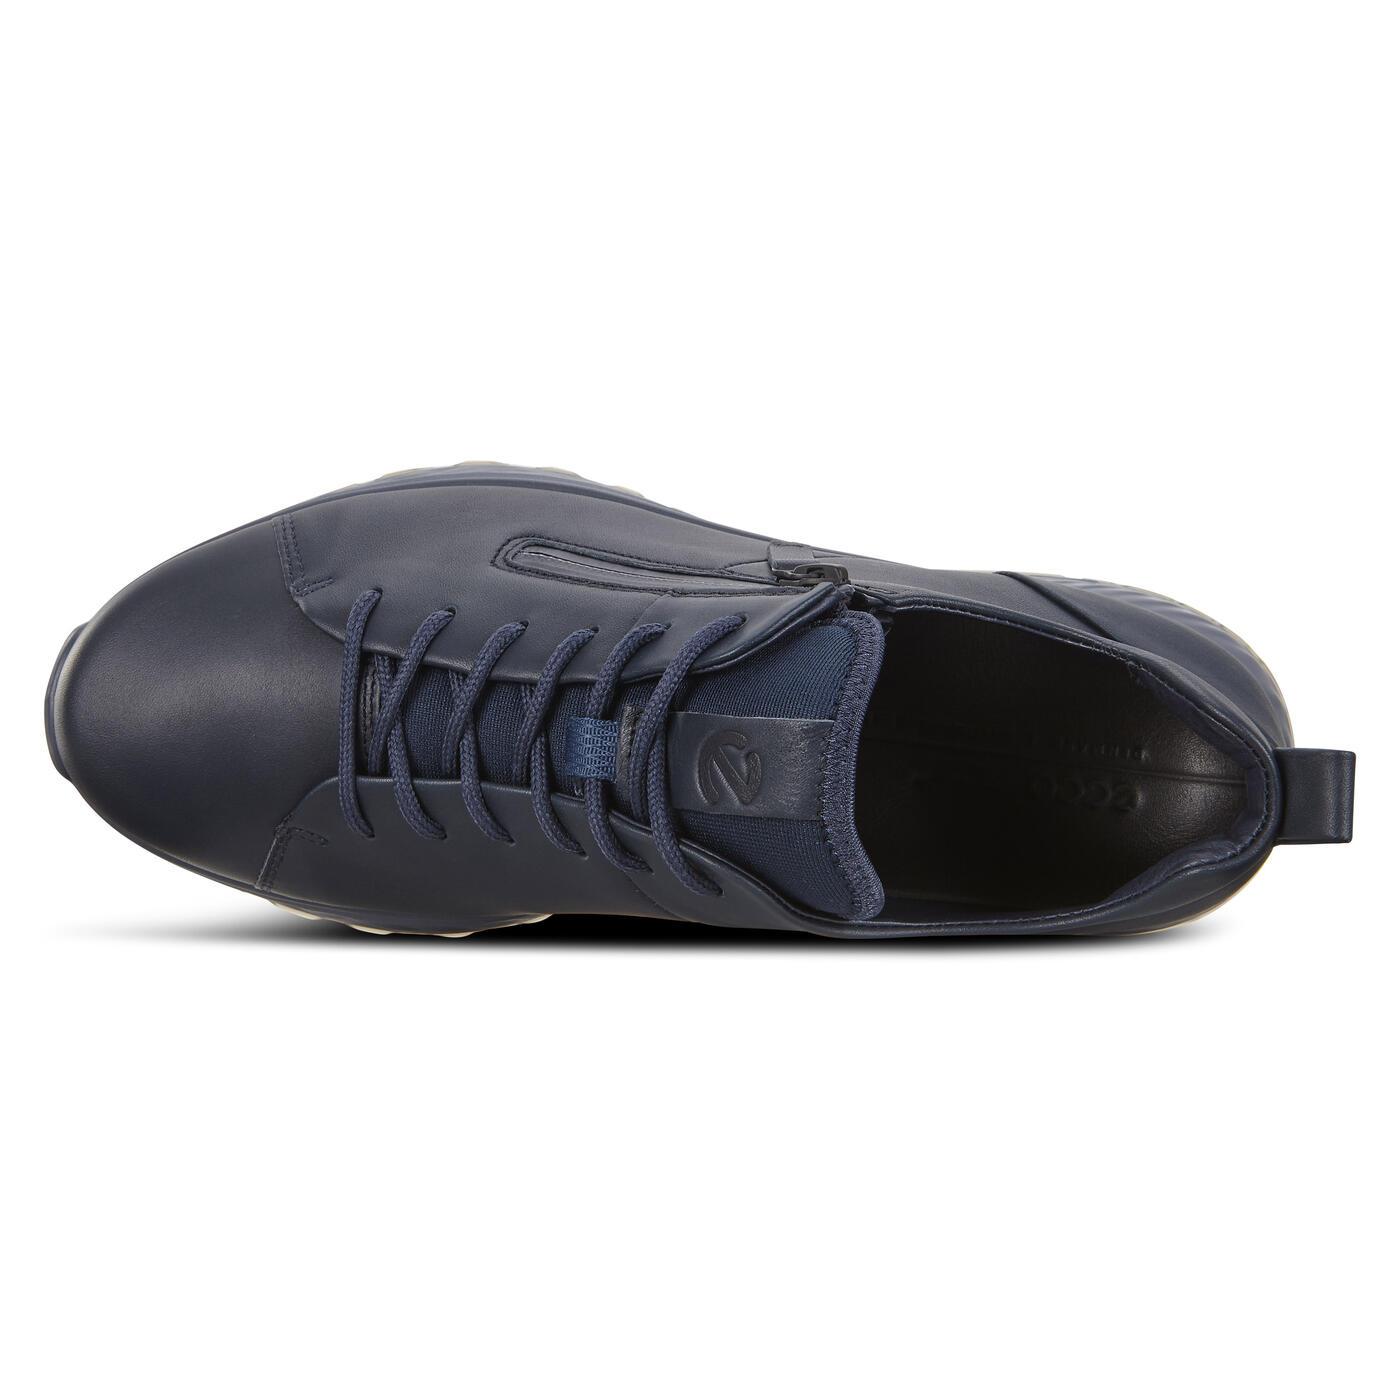 ECCO ST.1 M Sneaker